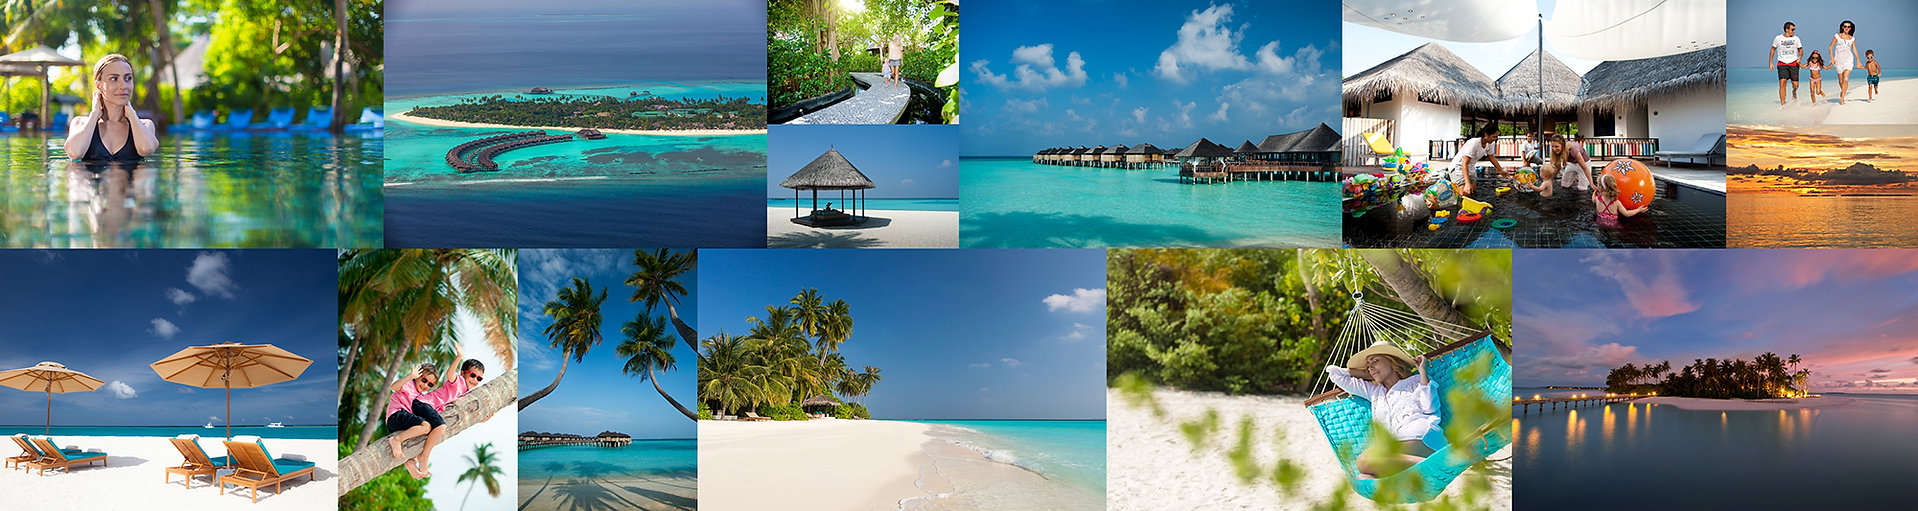 Sun Siyam Resorts, Maledivy